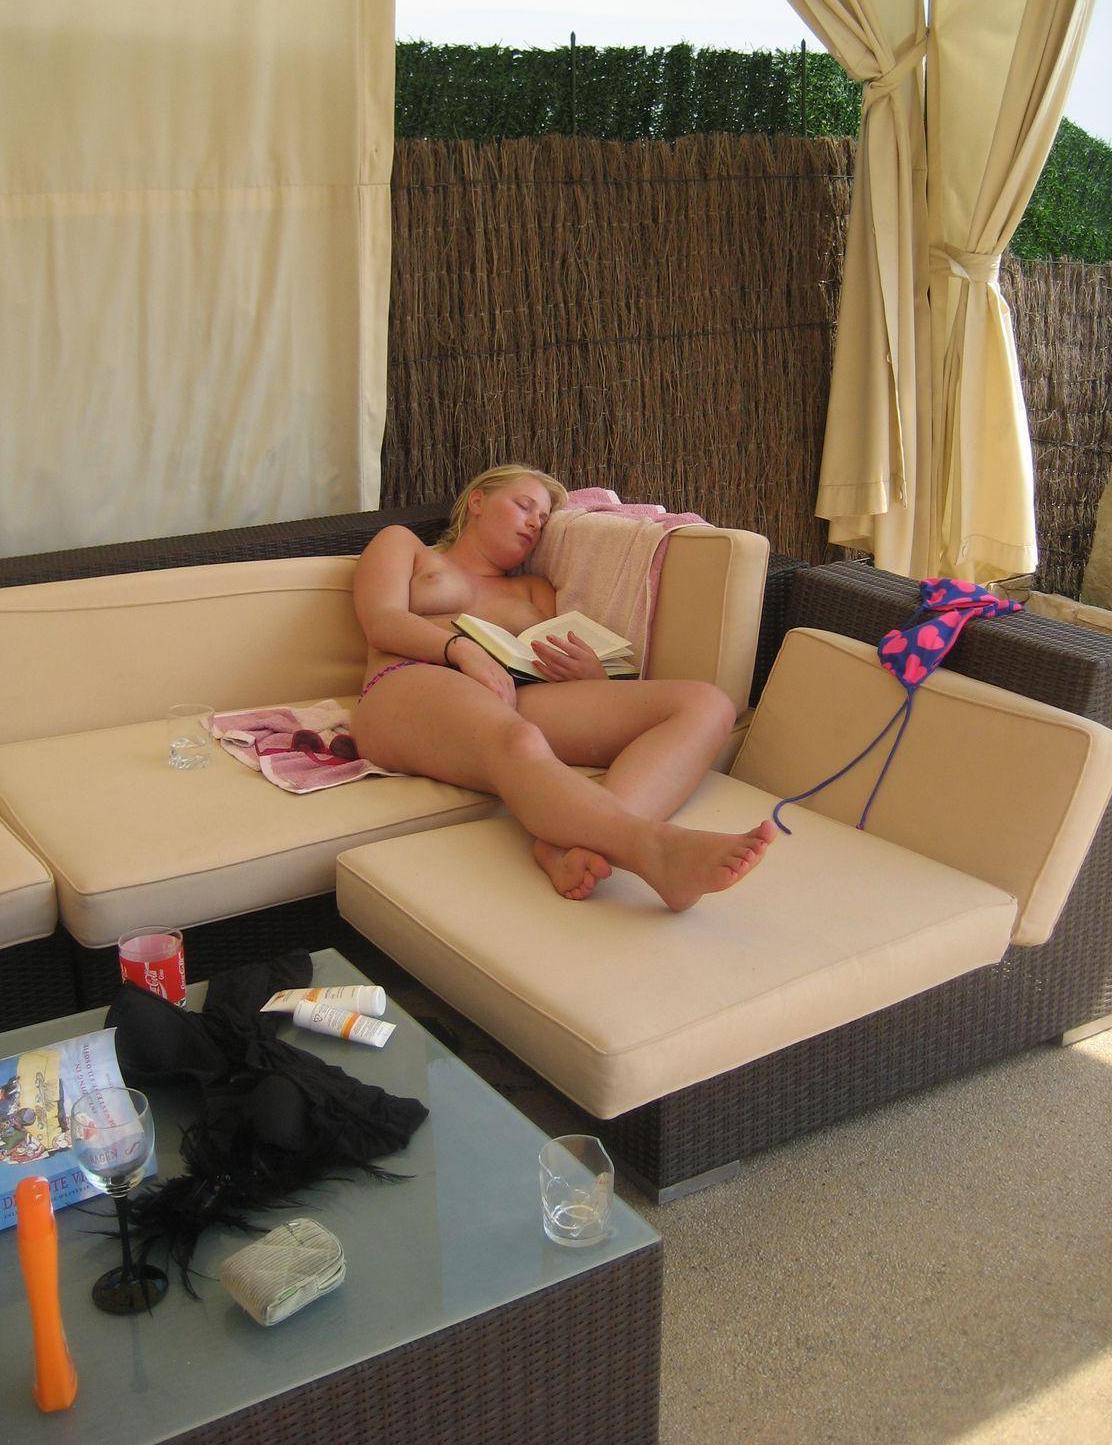 The nude reader's sedative